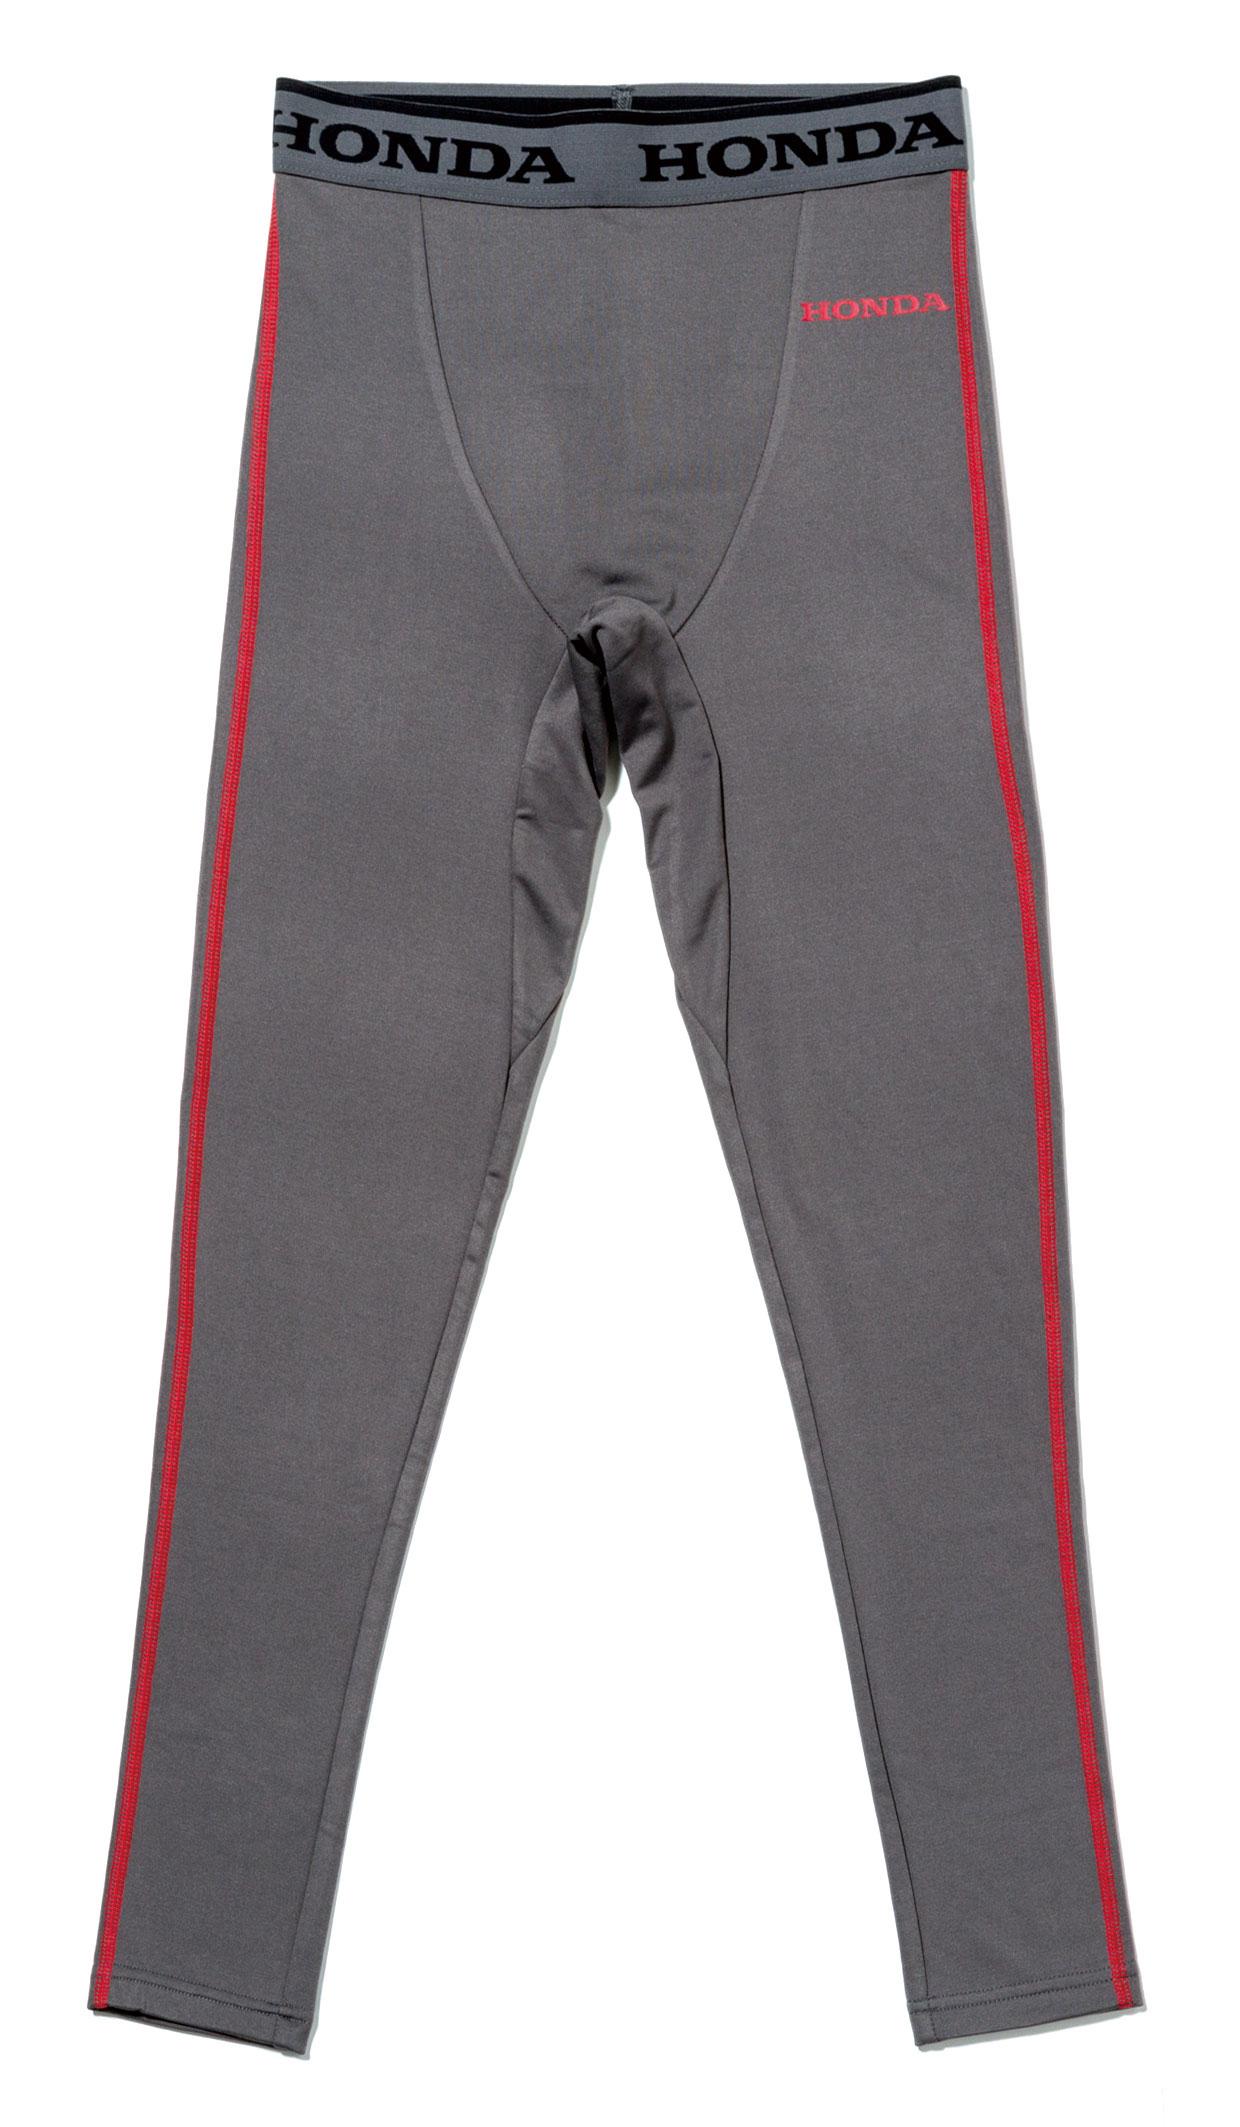 【HONDA RIDING GEAR】男用冬季內穿褲 - 「Webike-摩托百貨」